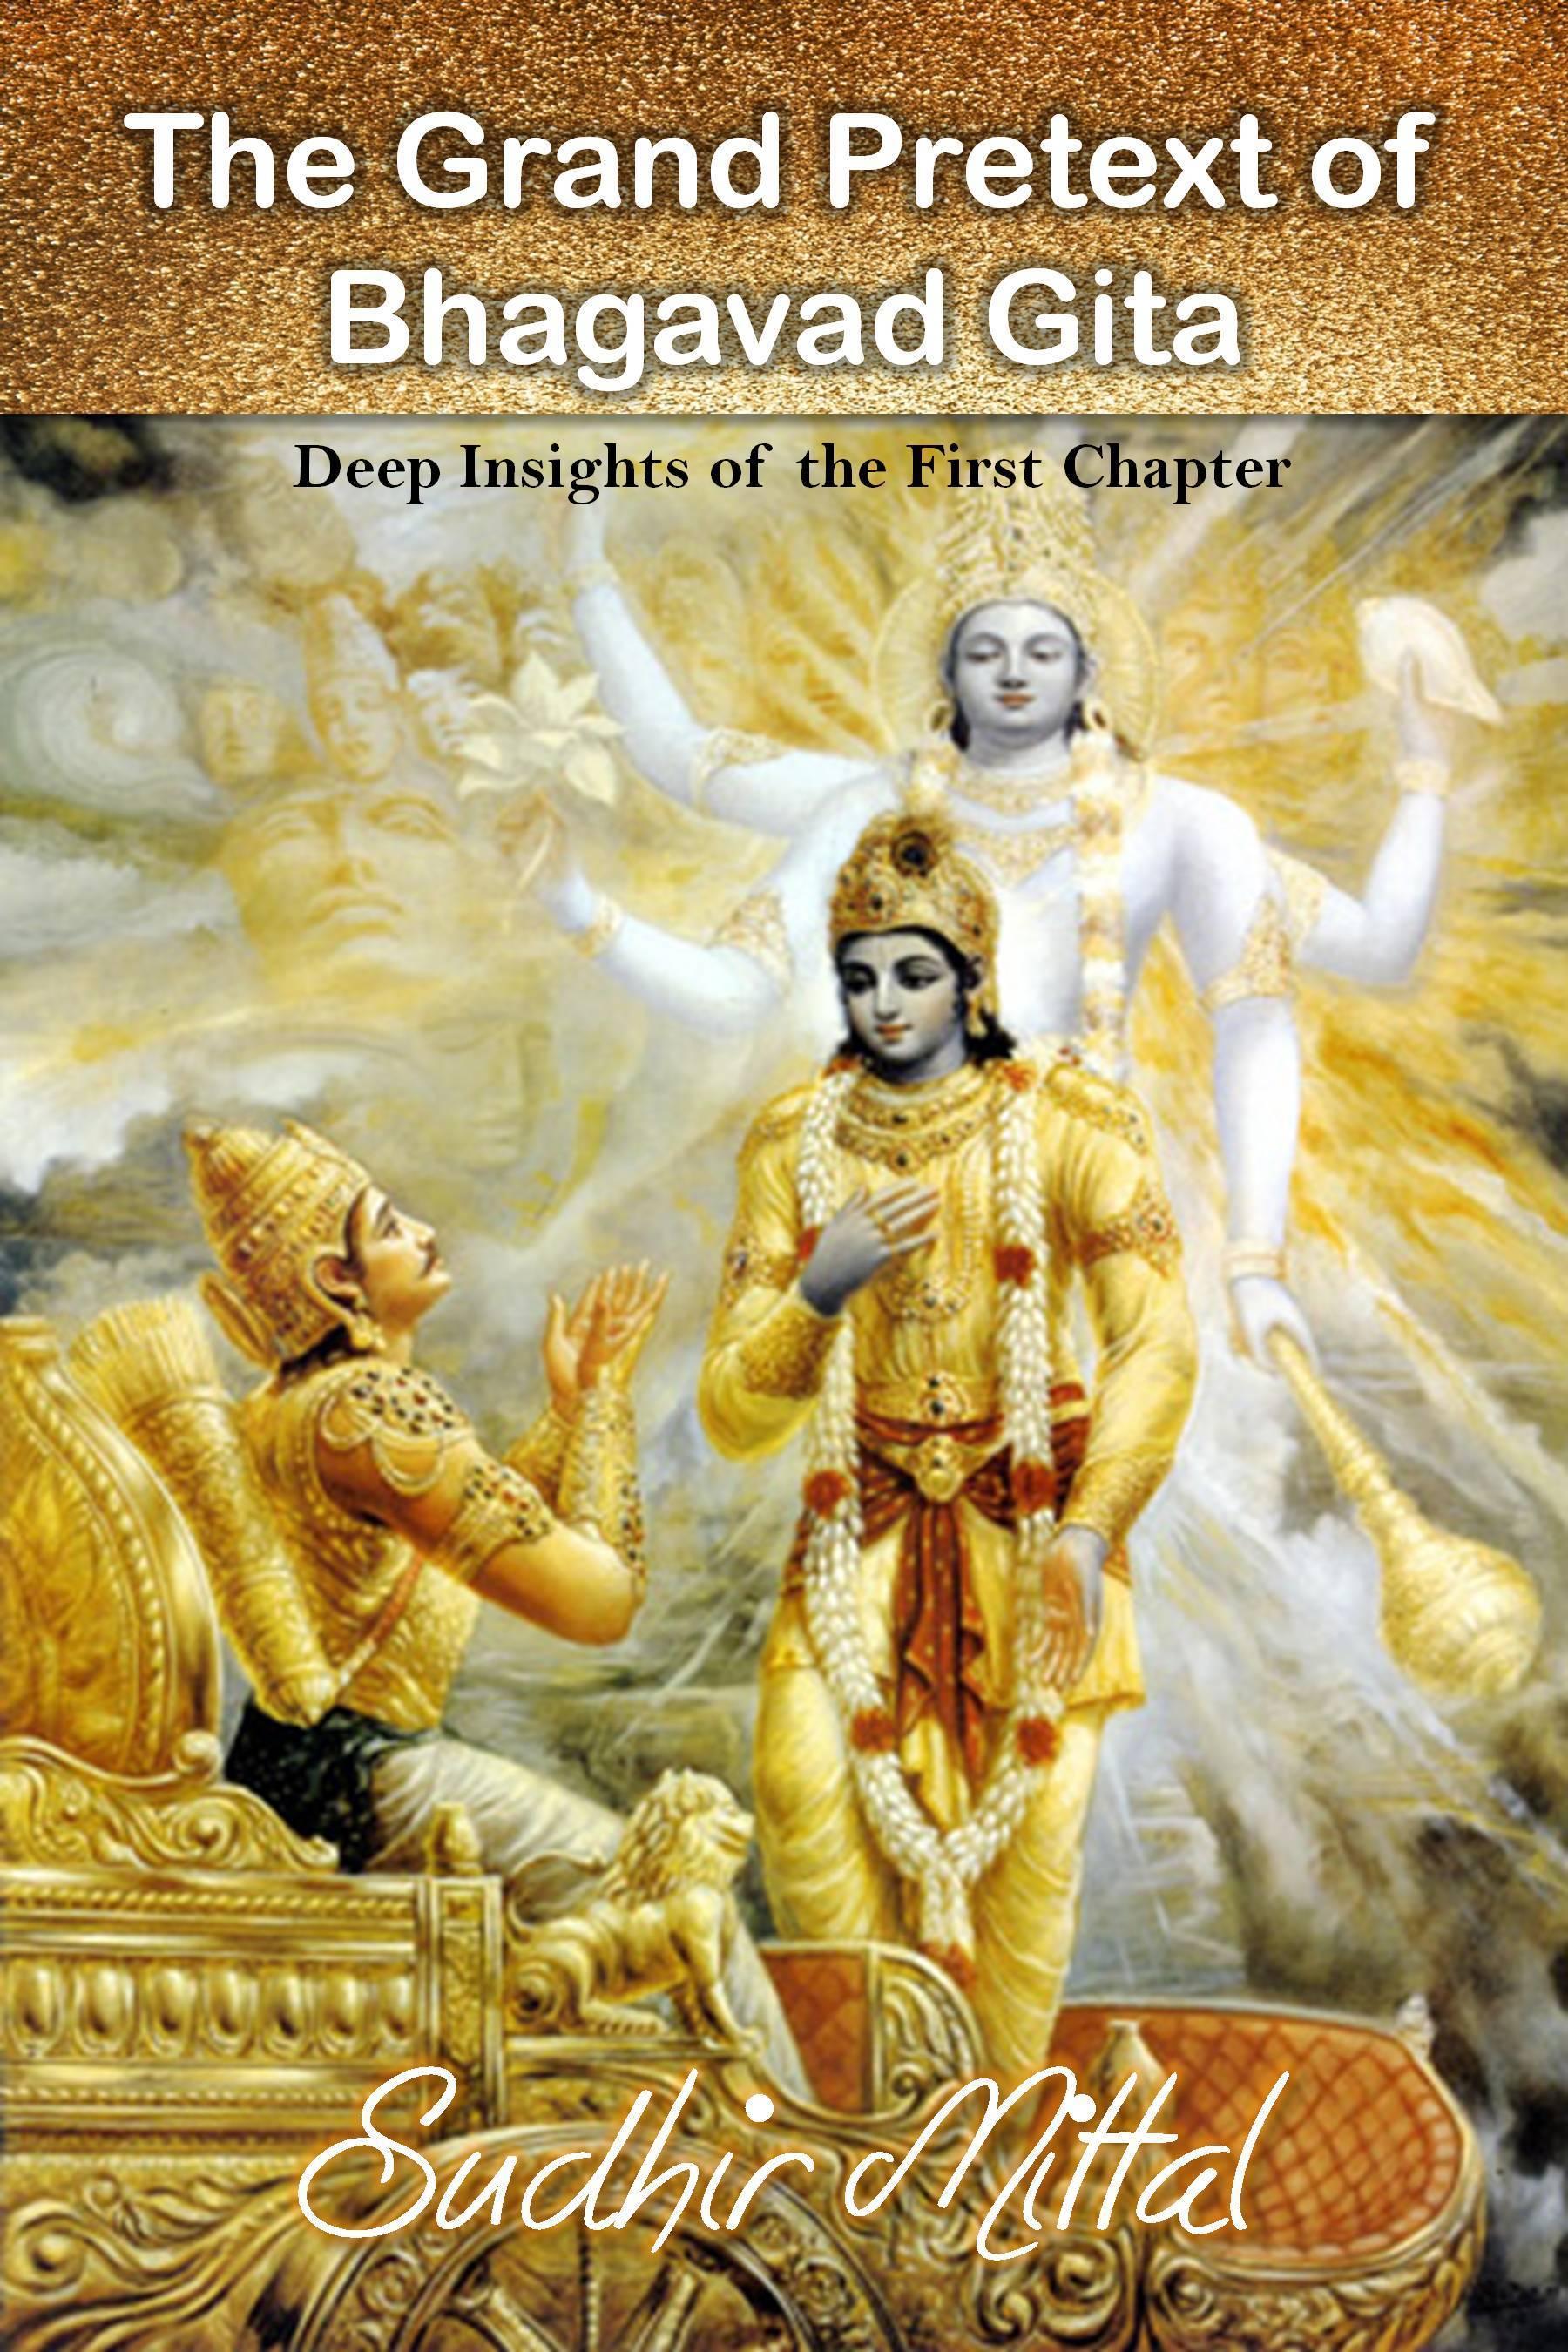 The Grand Pretext of Bhagavad Gita Sudhir Mittal